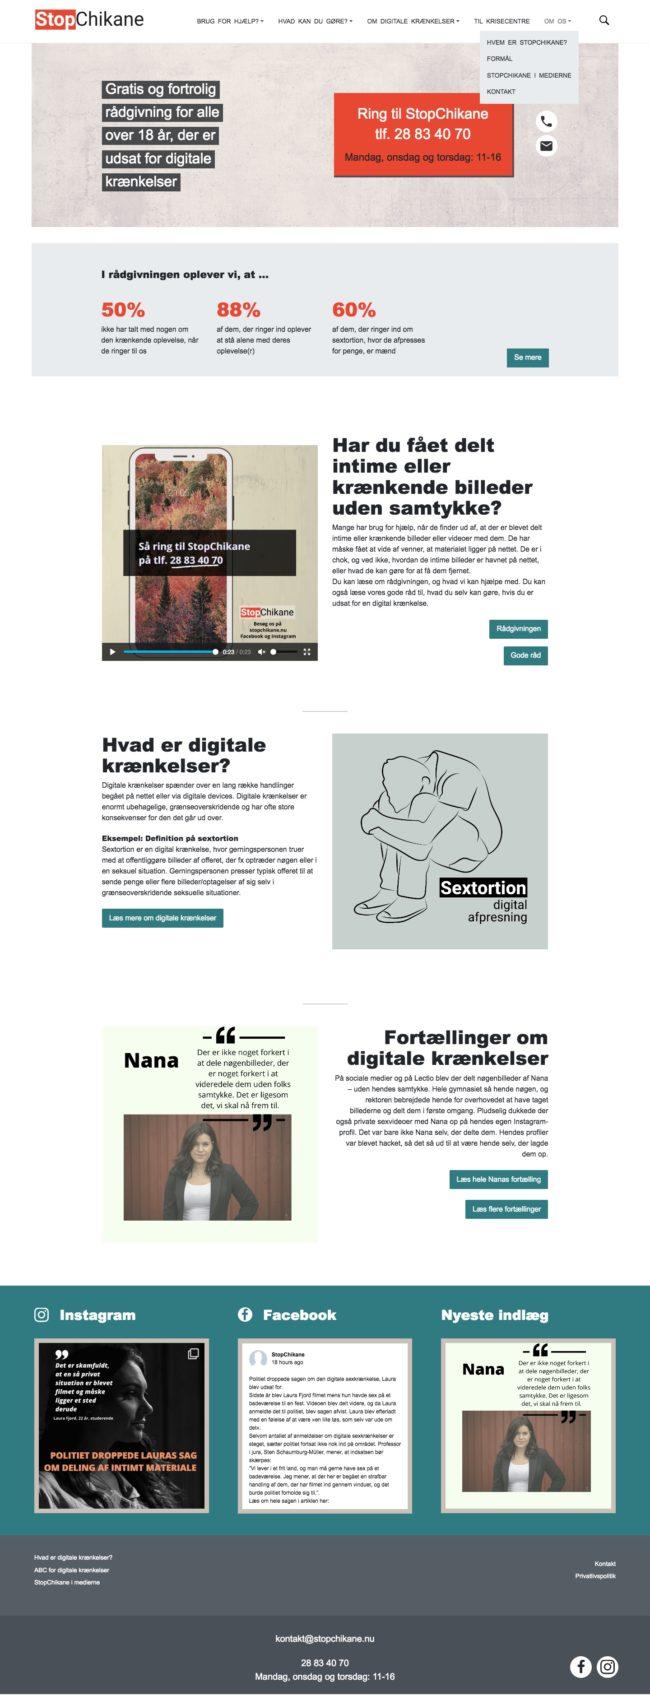 stopchikane.nu - screenshot, hele forsiden